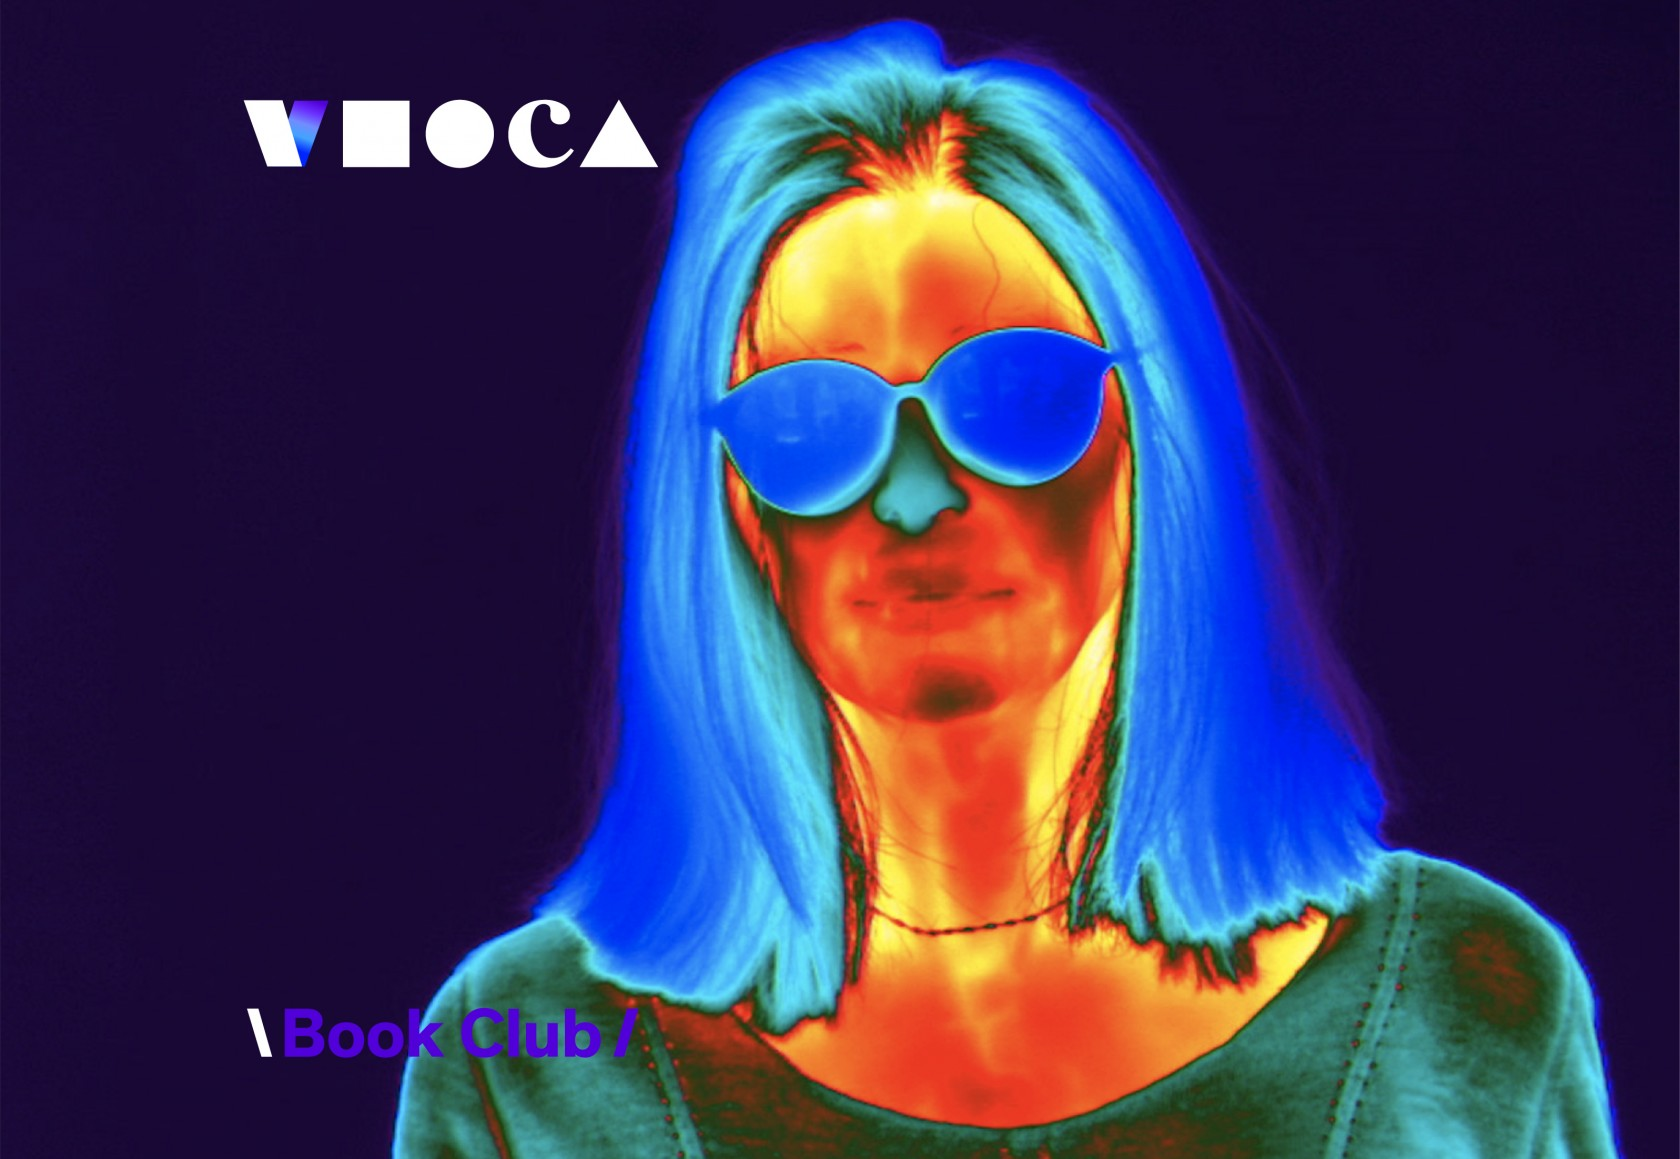 Virtual MOCA: Book Club